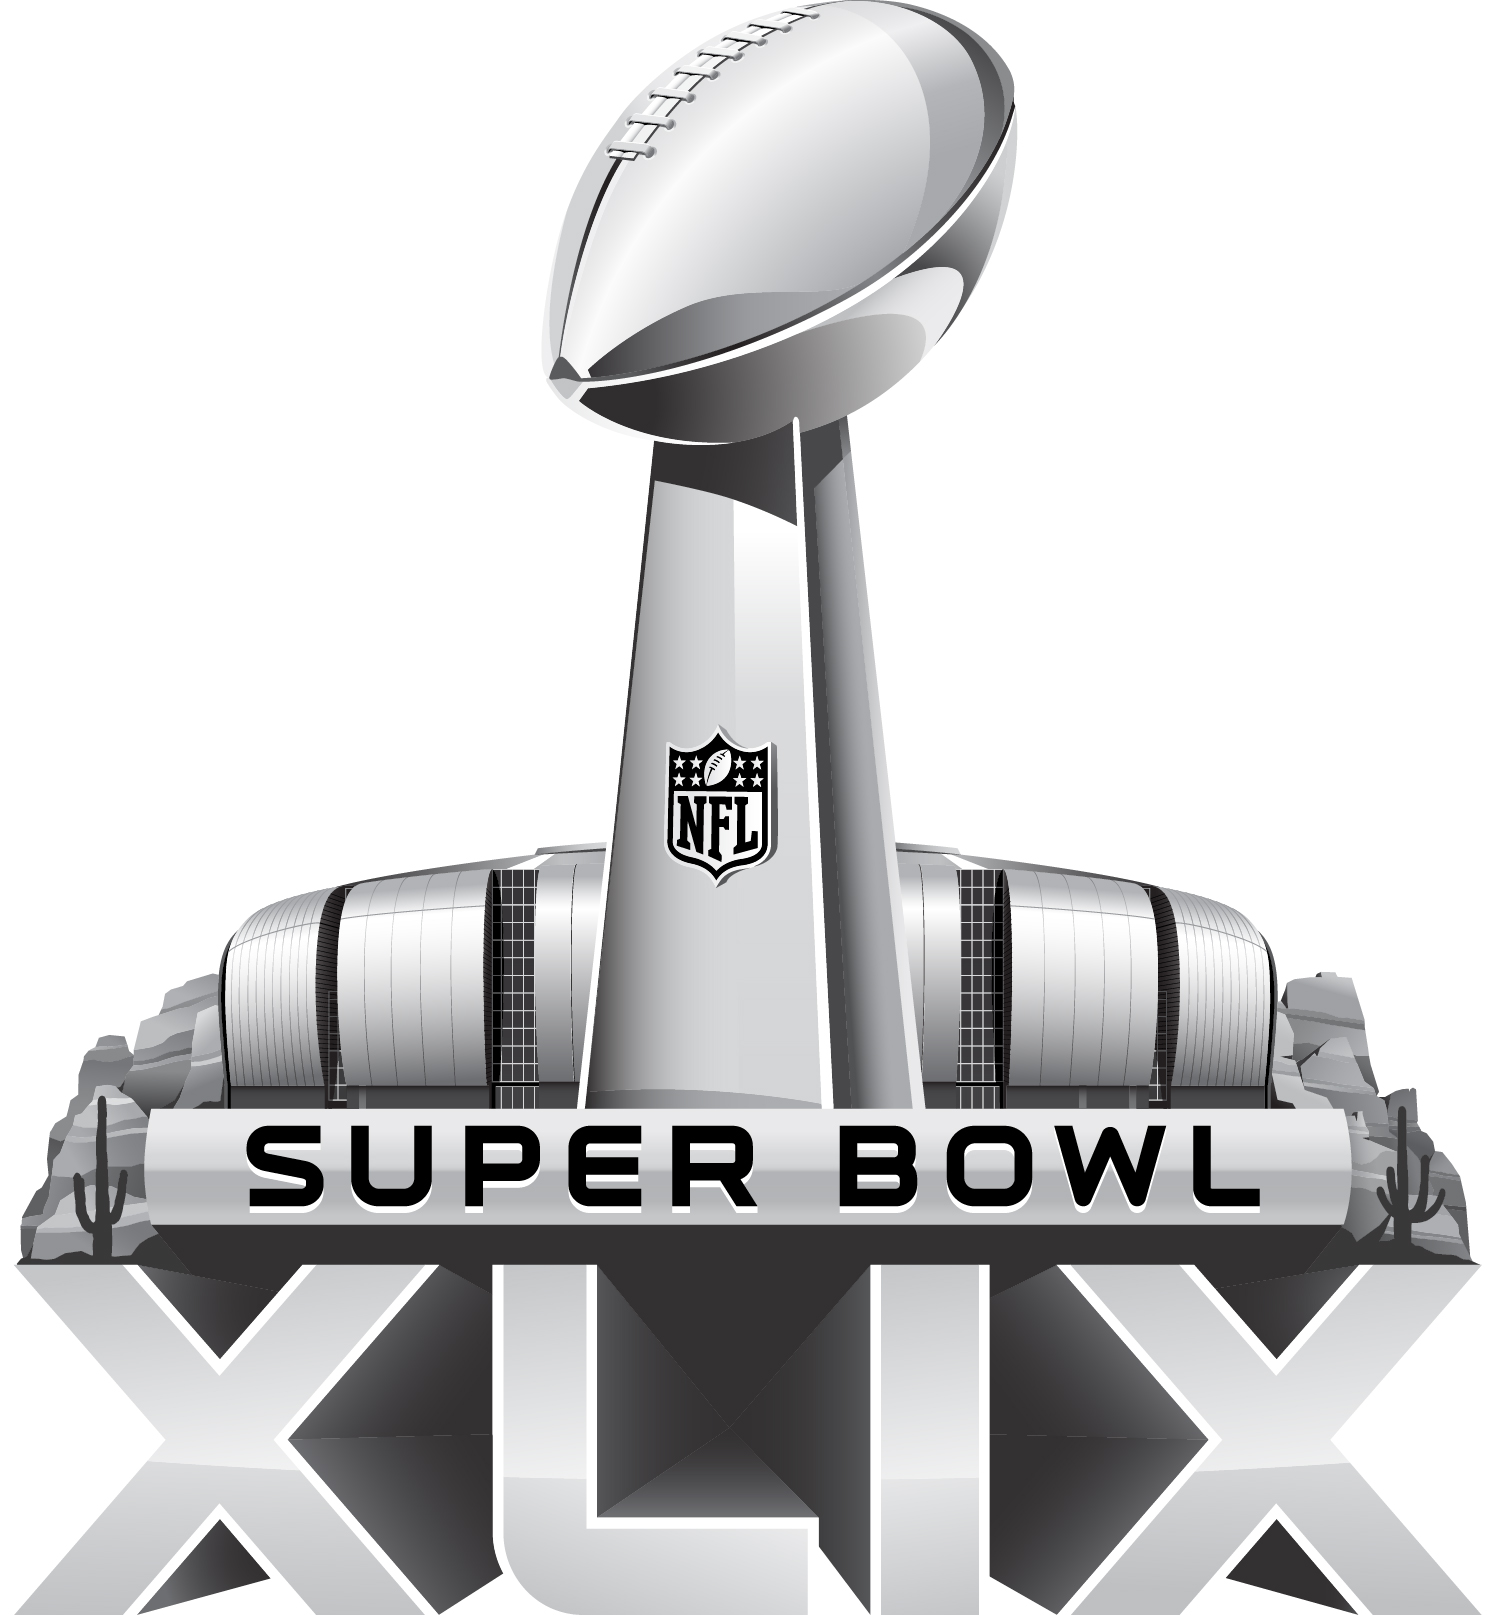 Super Bowl Xlix Logo Png Images & Pictures - Becuo